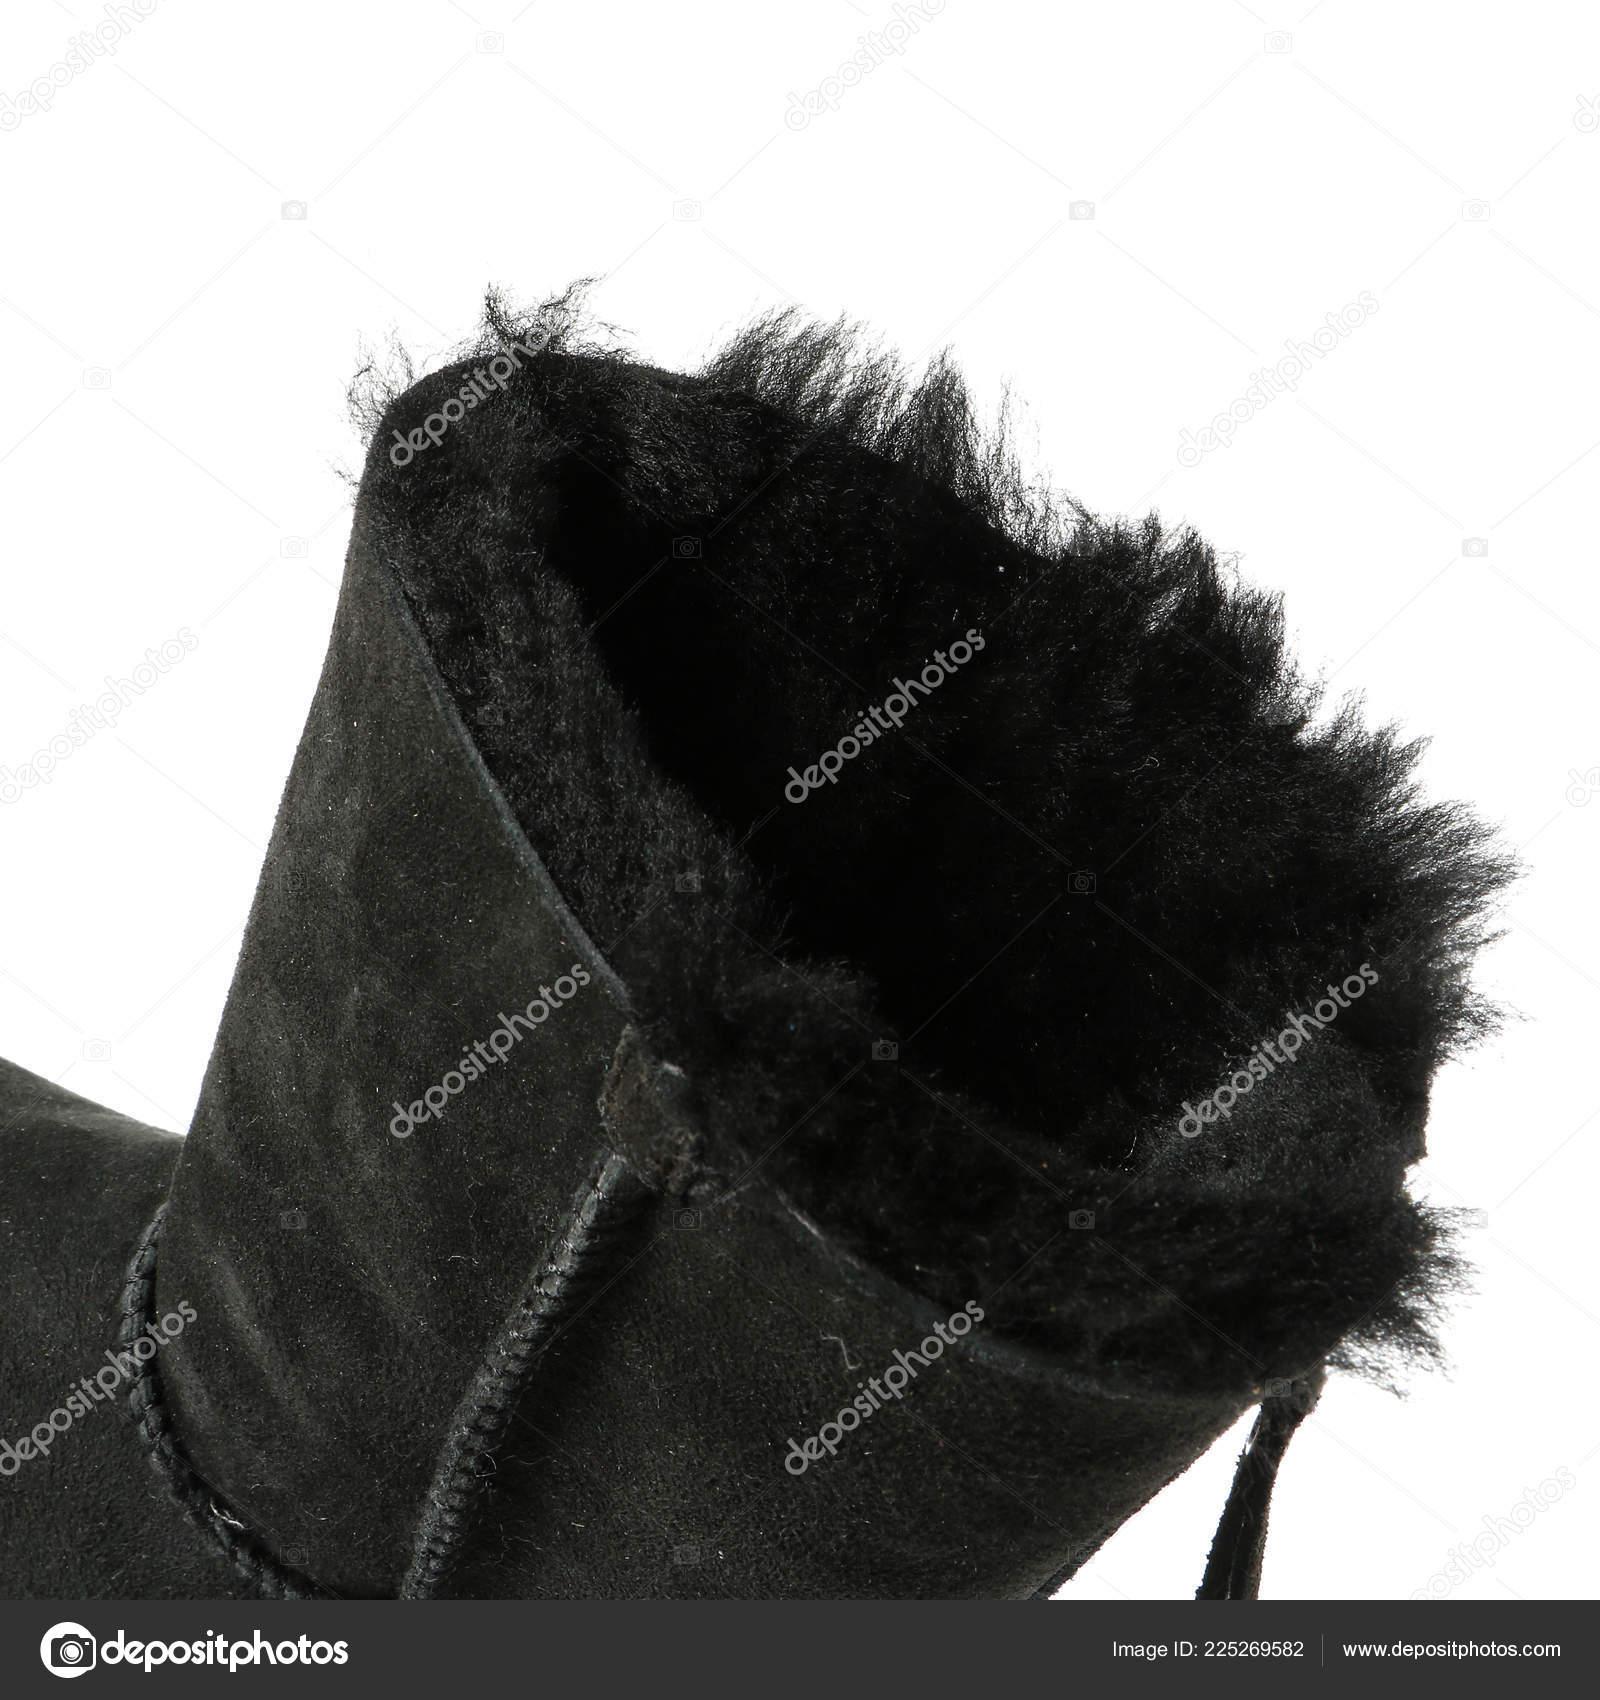 867693e9aa7 Ψηλές Μπότες Ντεμί Σεζόν Των Γυναικών Που Απομονώνονται Λευκό Φόντο —  Φωτογραφία Αρχείου